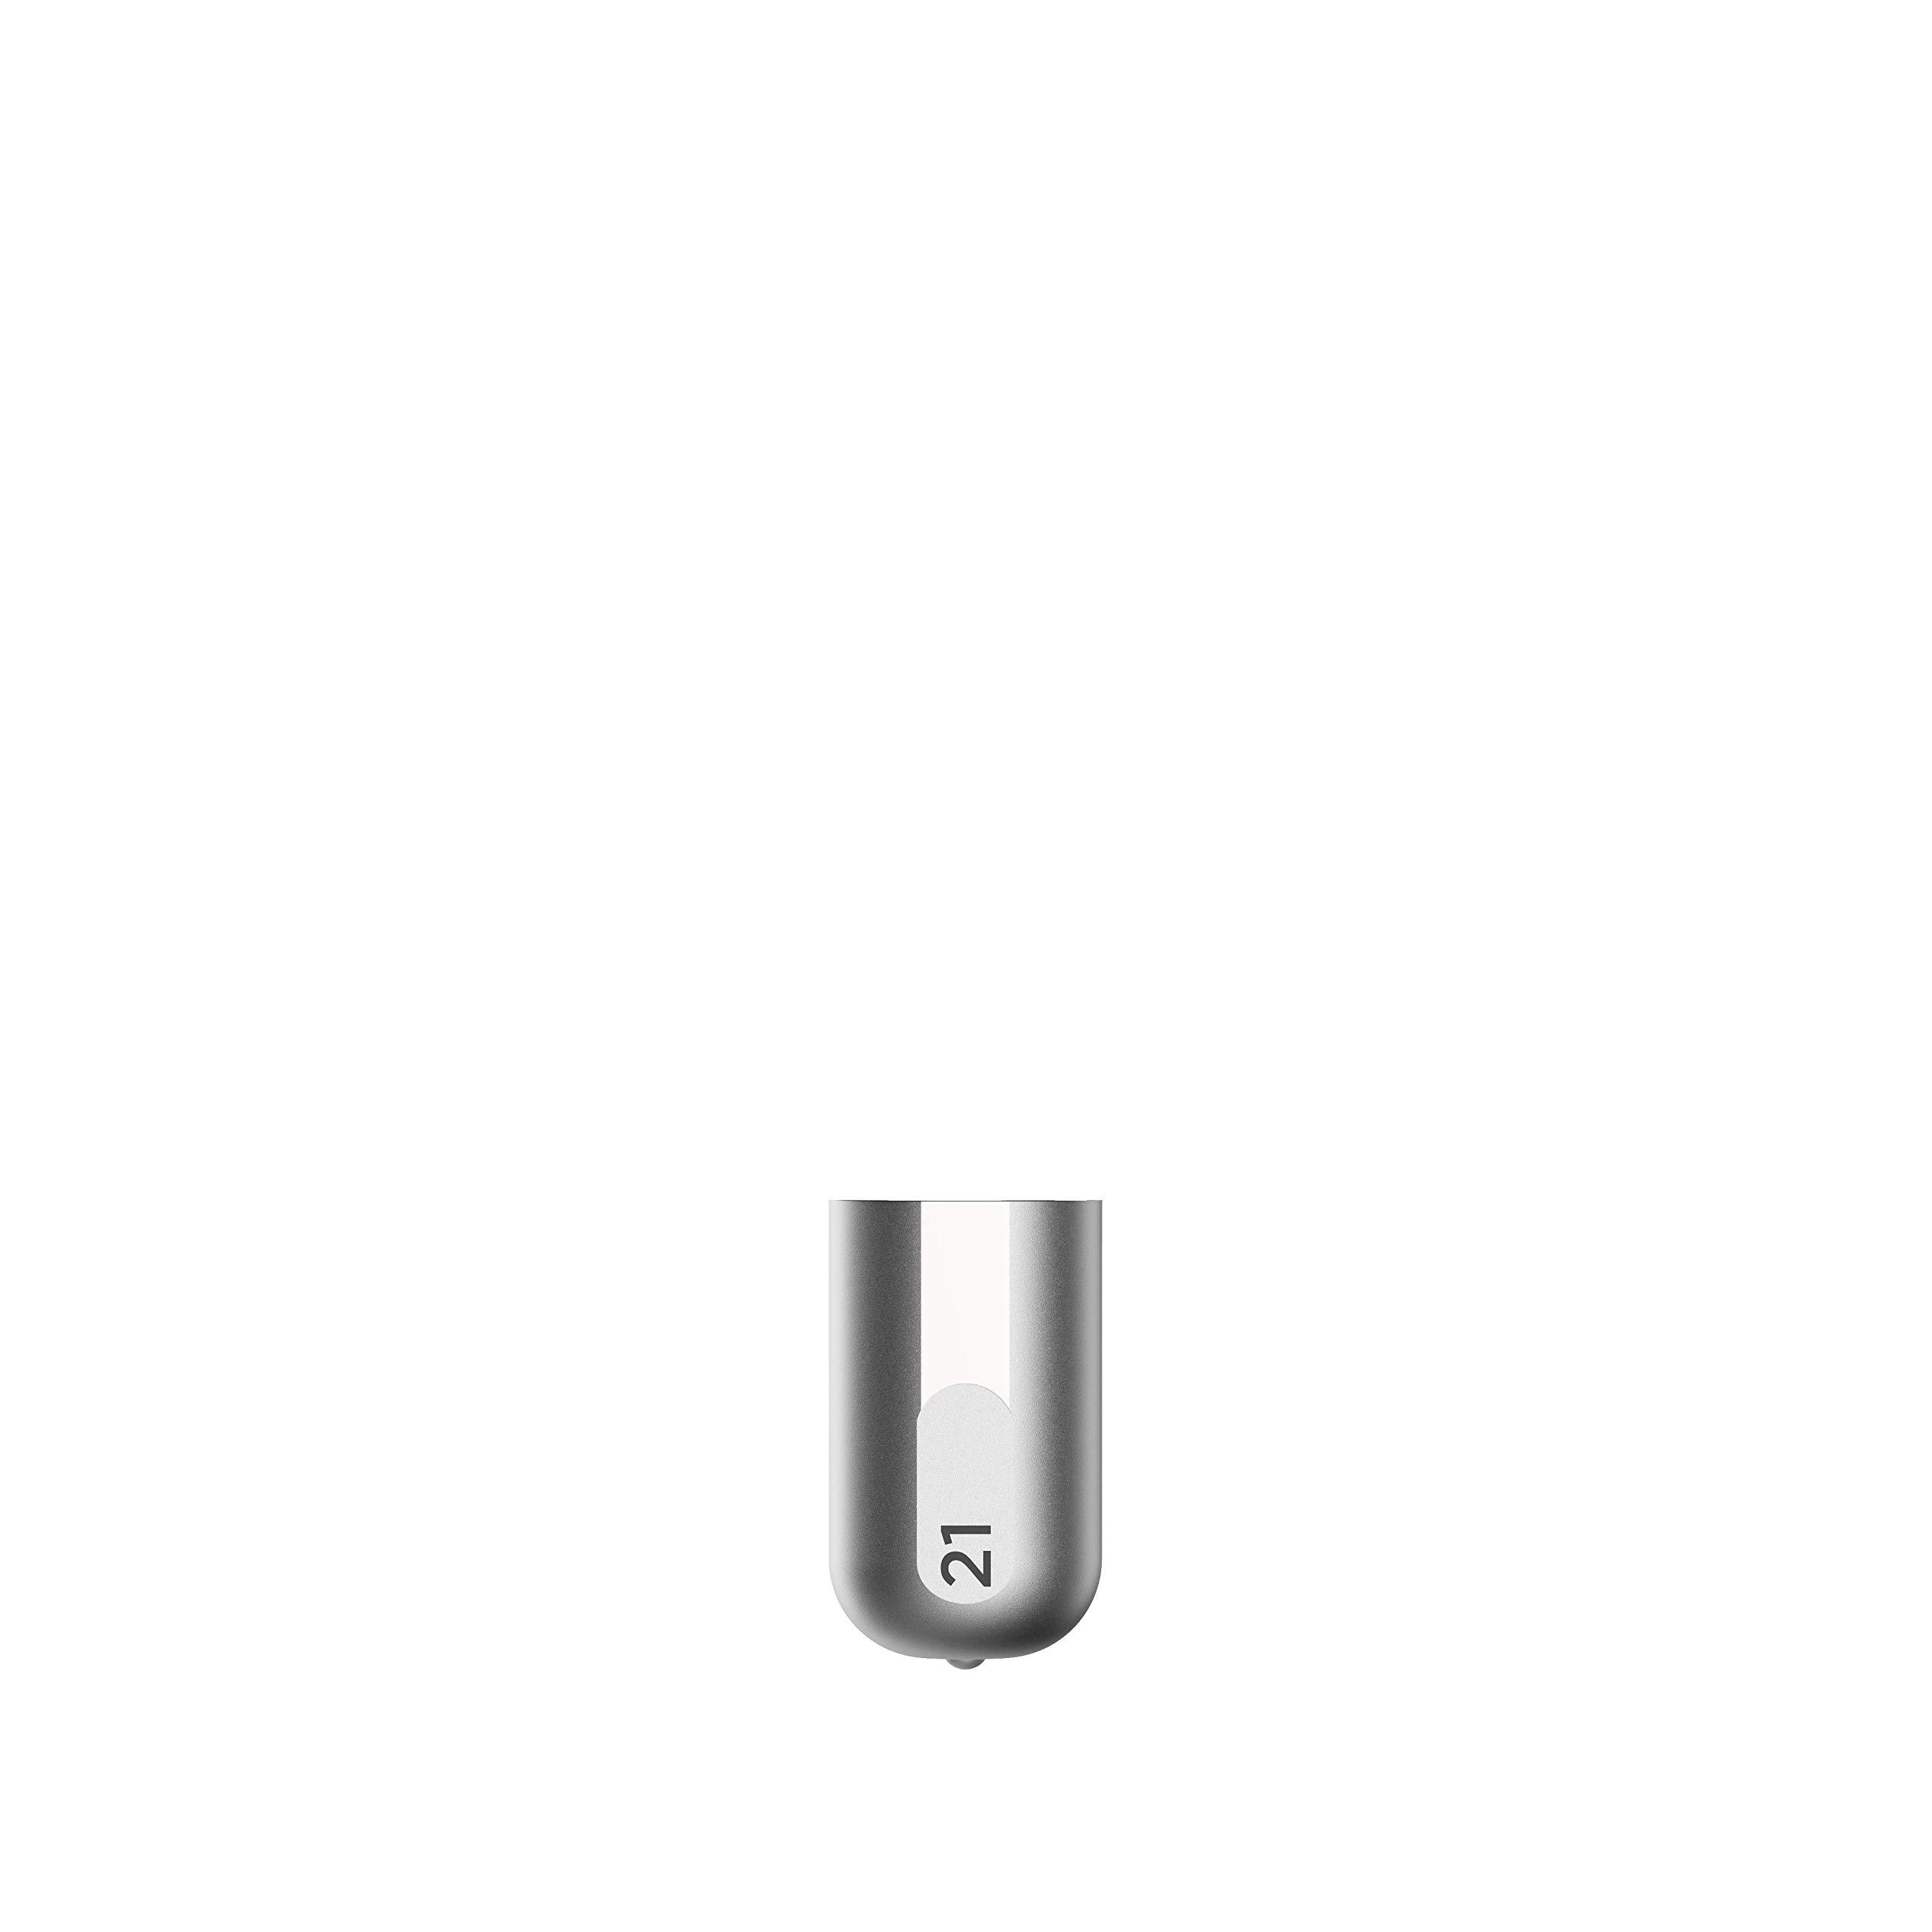 Cricut 2006836 Tip, Fine QuickSwap Debossing, Silver